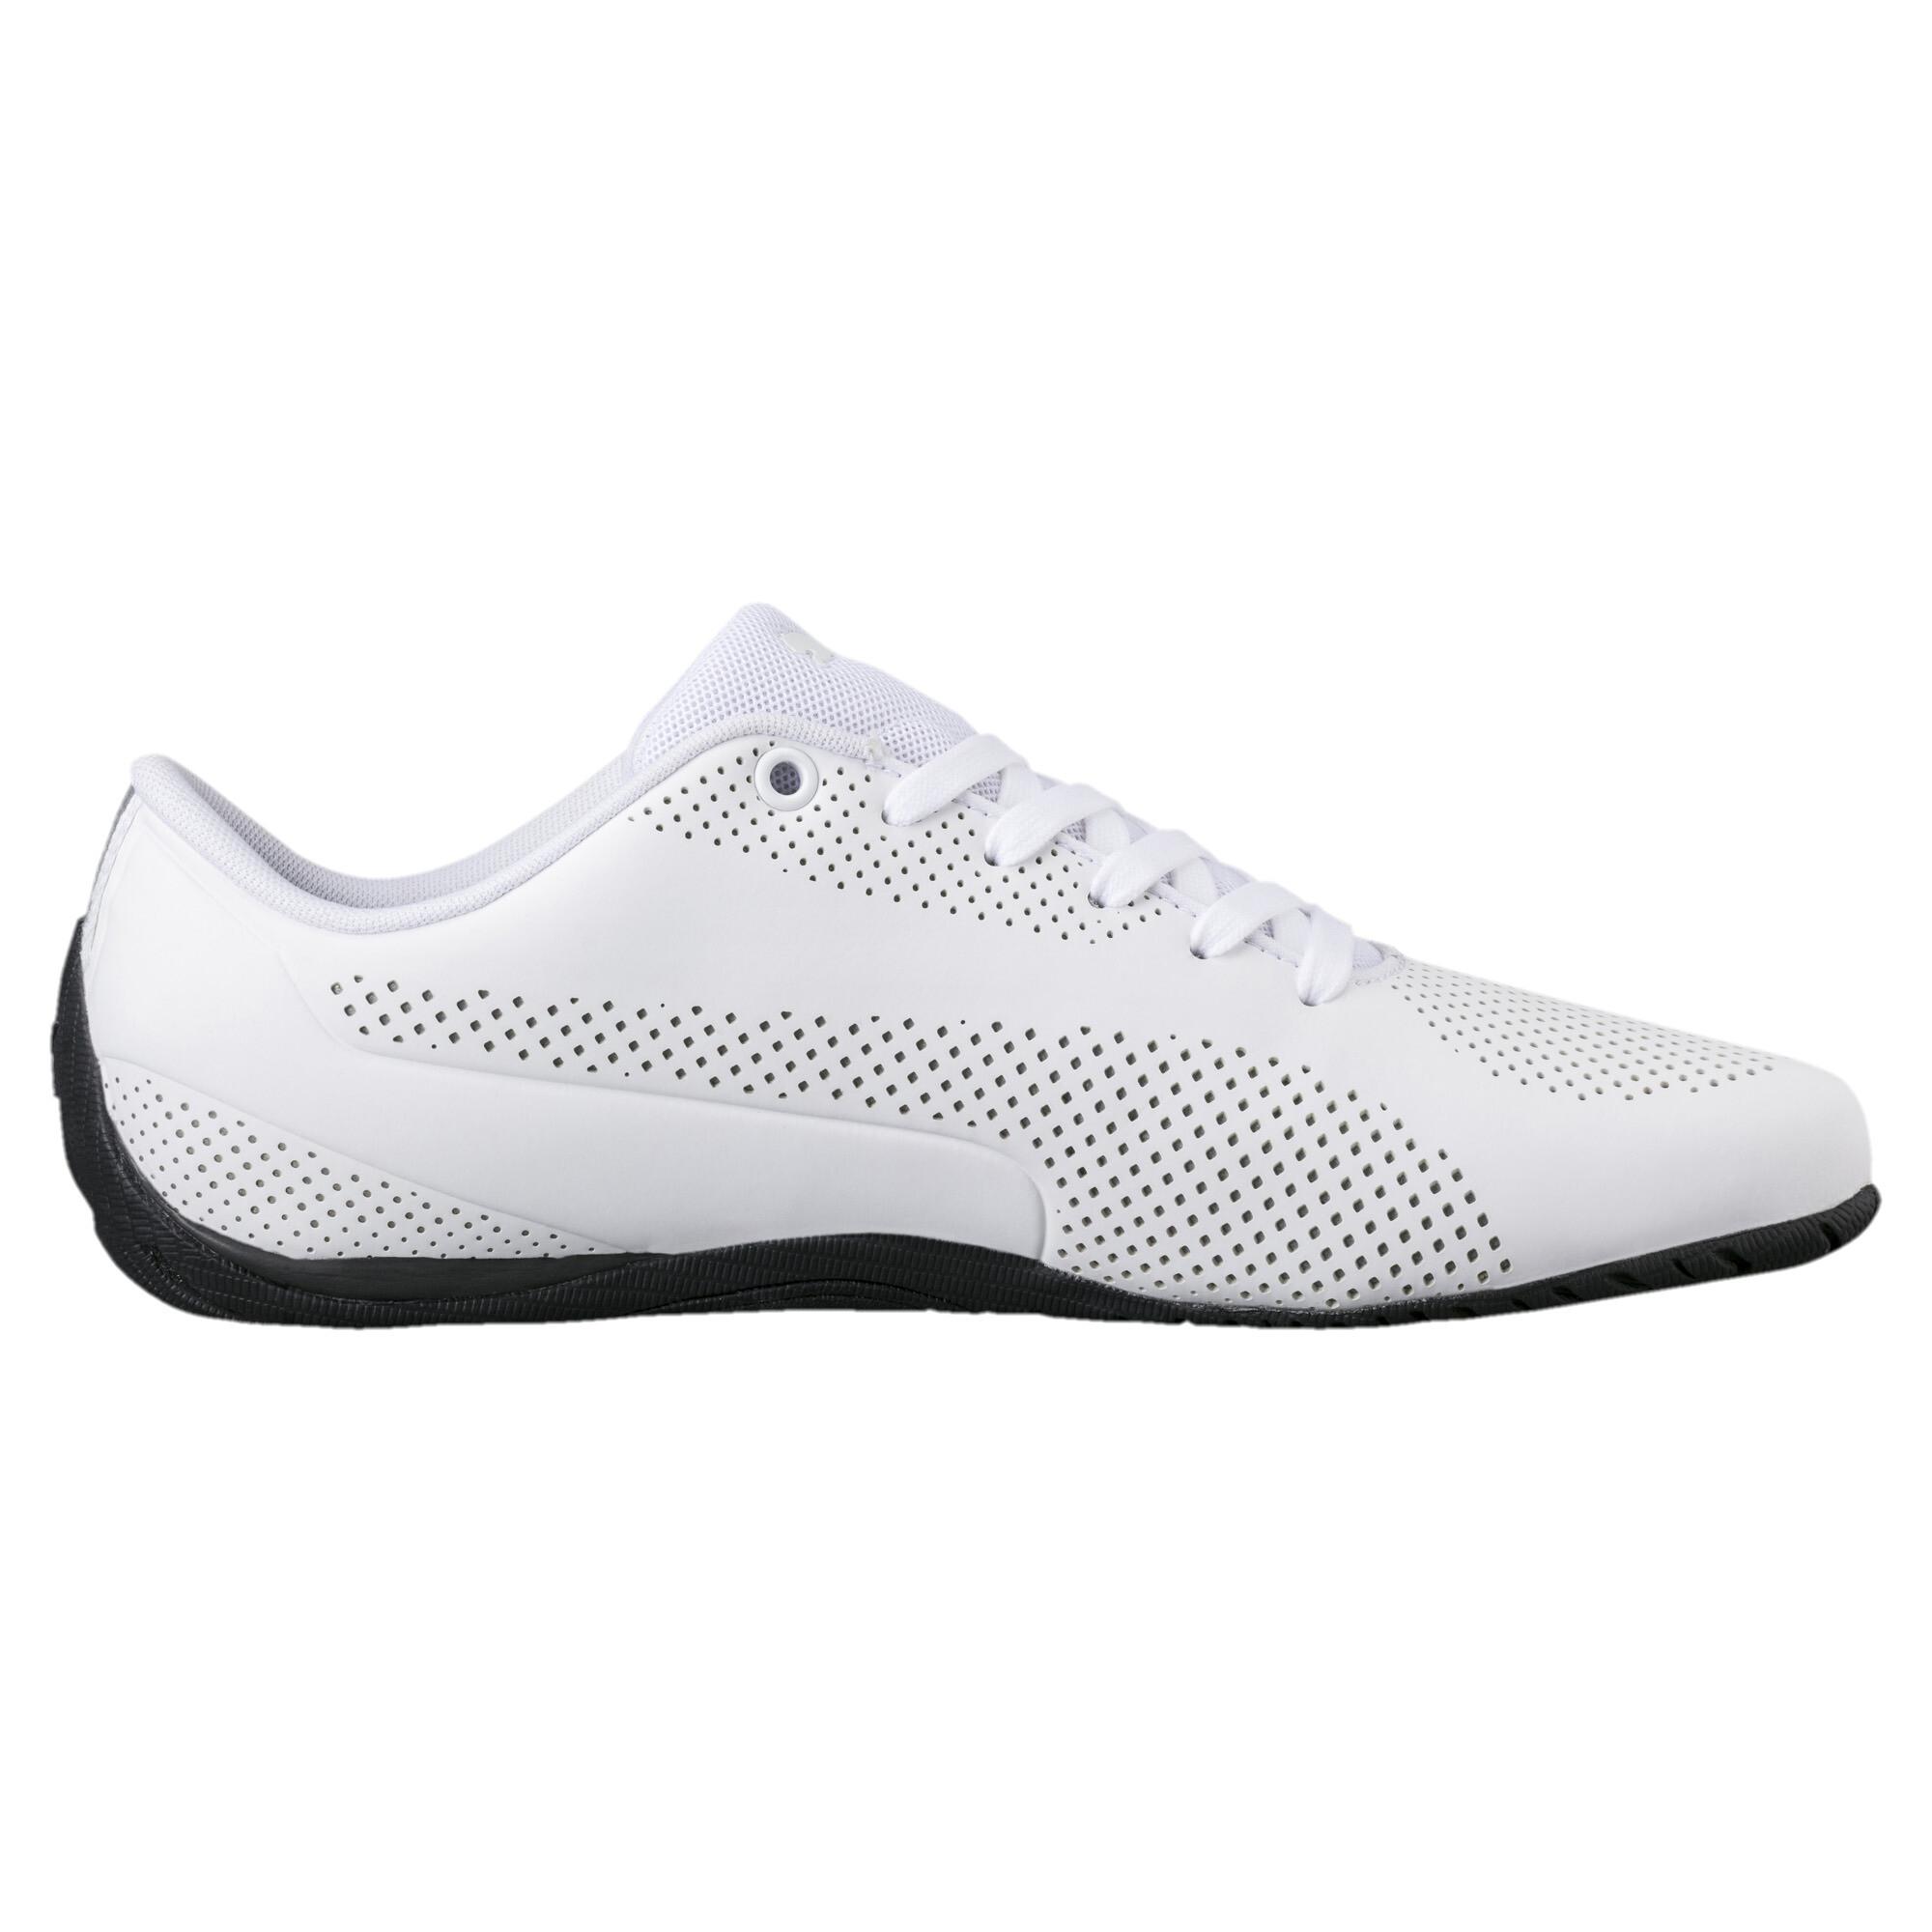 PUMA-Men-039-s-Drift-Cat-Ultra-Reflective-Shoes thumbnail 15